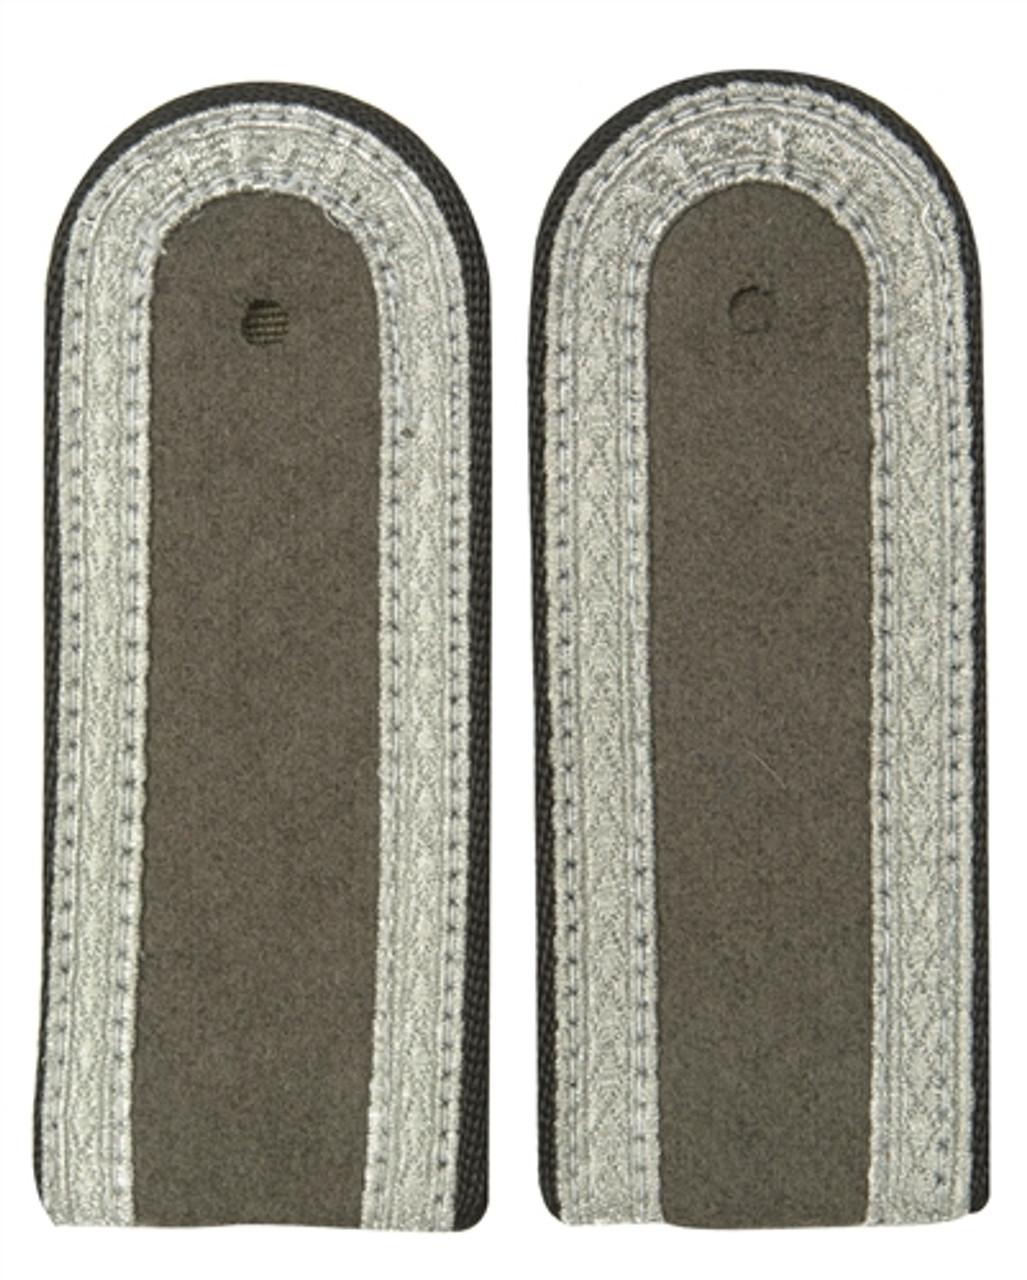 NVA NCO Shoulder Boards - Pioneer from Hessen Surplus